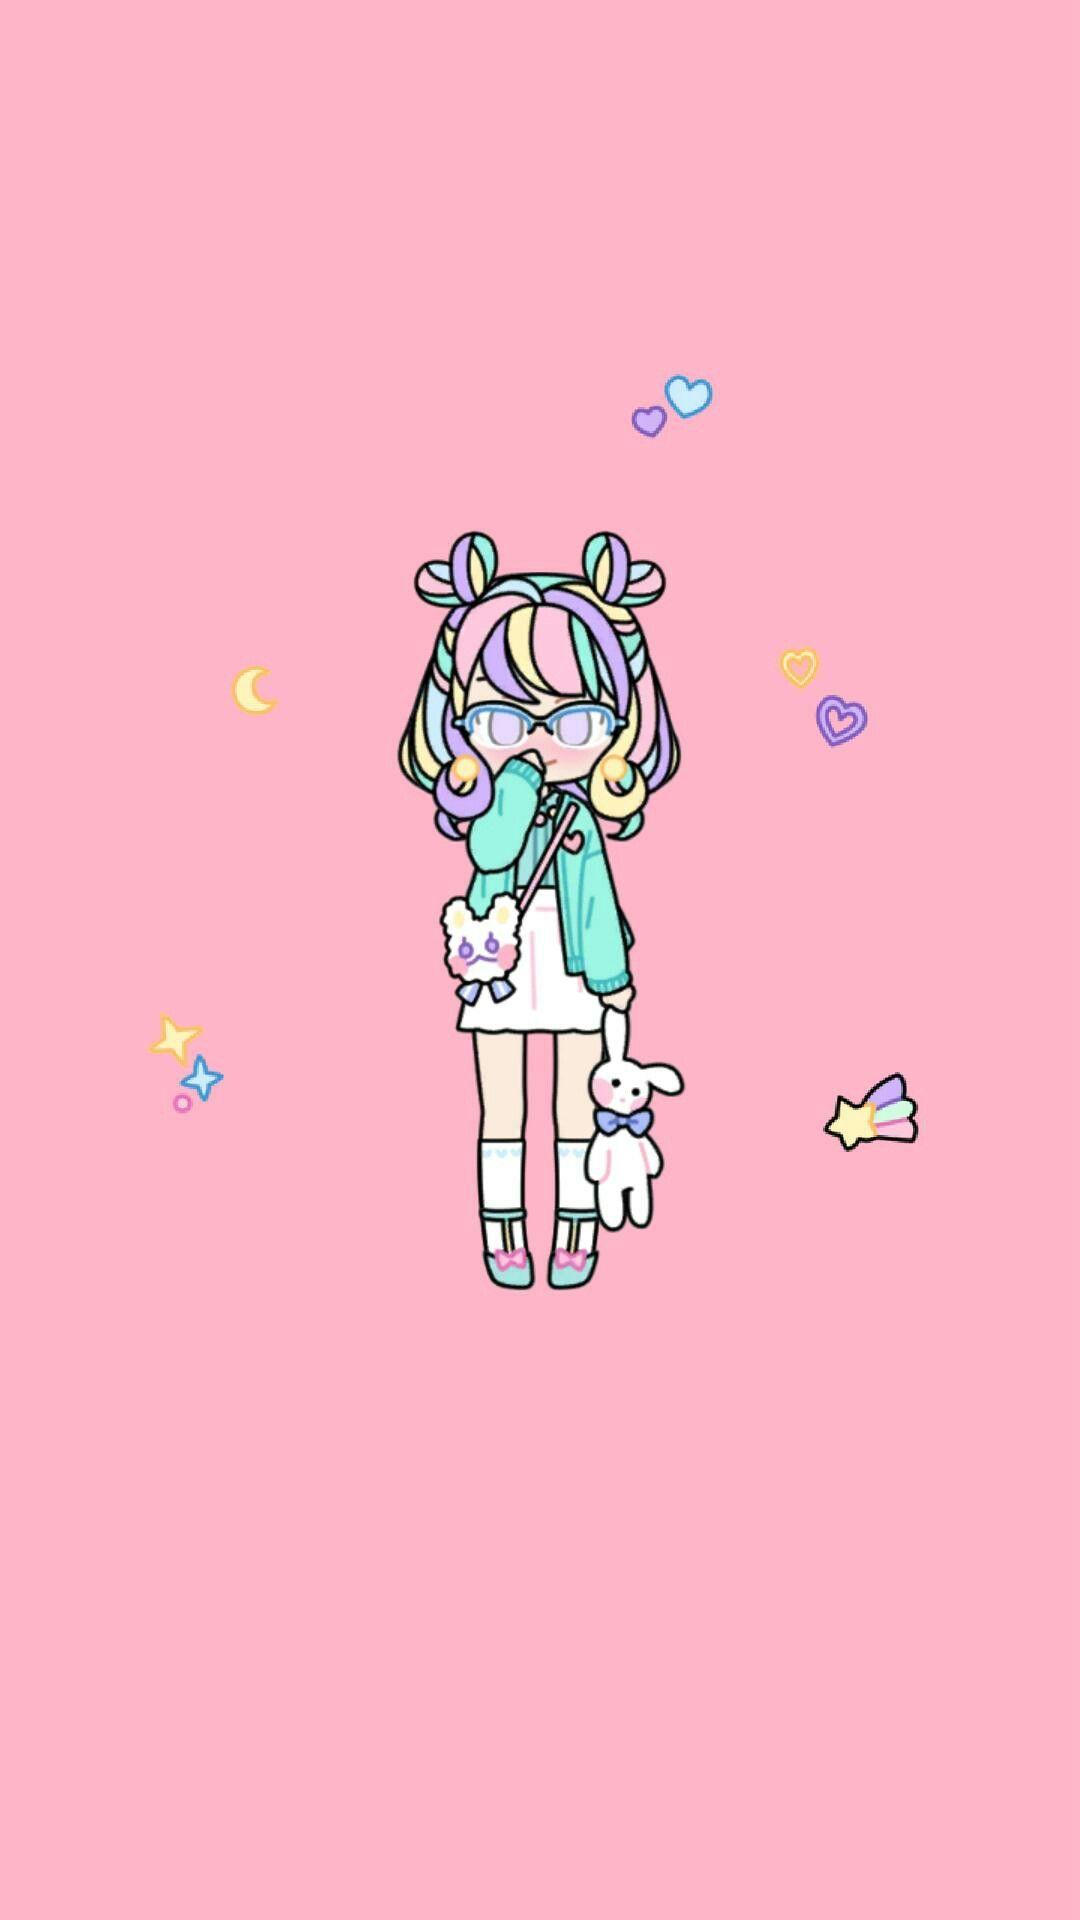 Cute App Pastel Girl Cute Pastel Wallpaper Cute App Girl Wallpaper